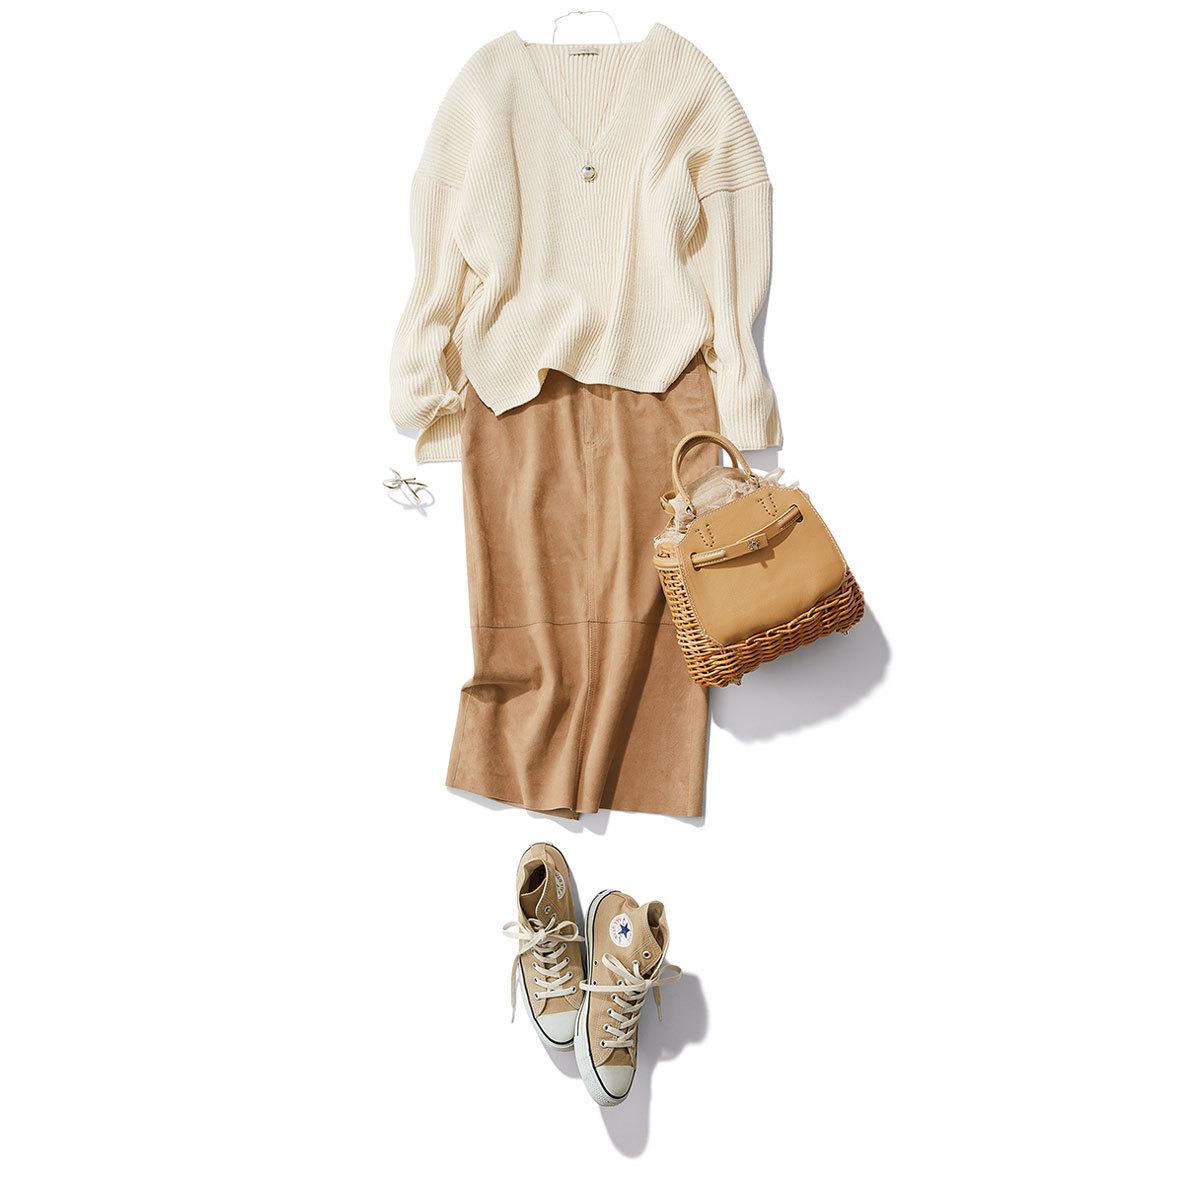 ■Vネックの白ニット×スエードのタイトスカートコーデ